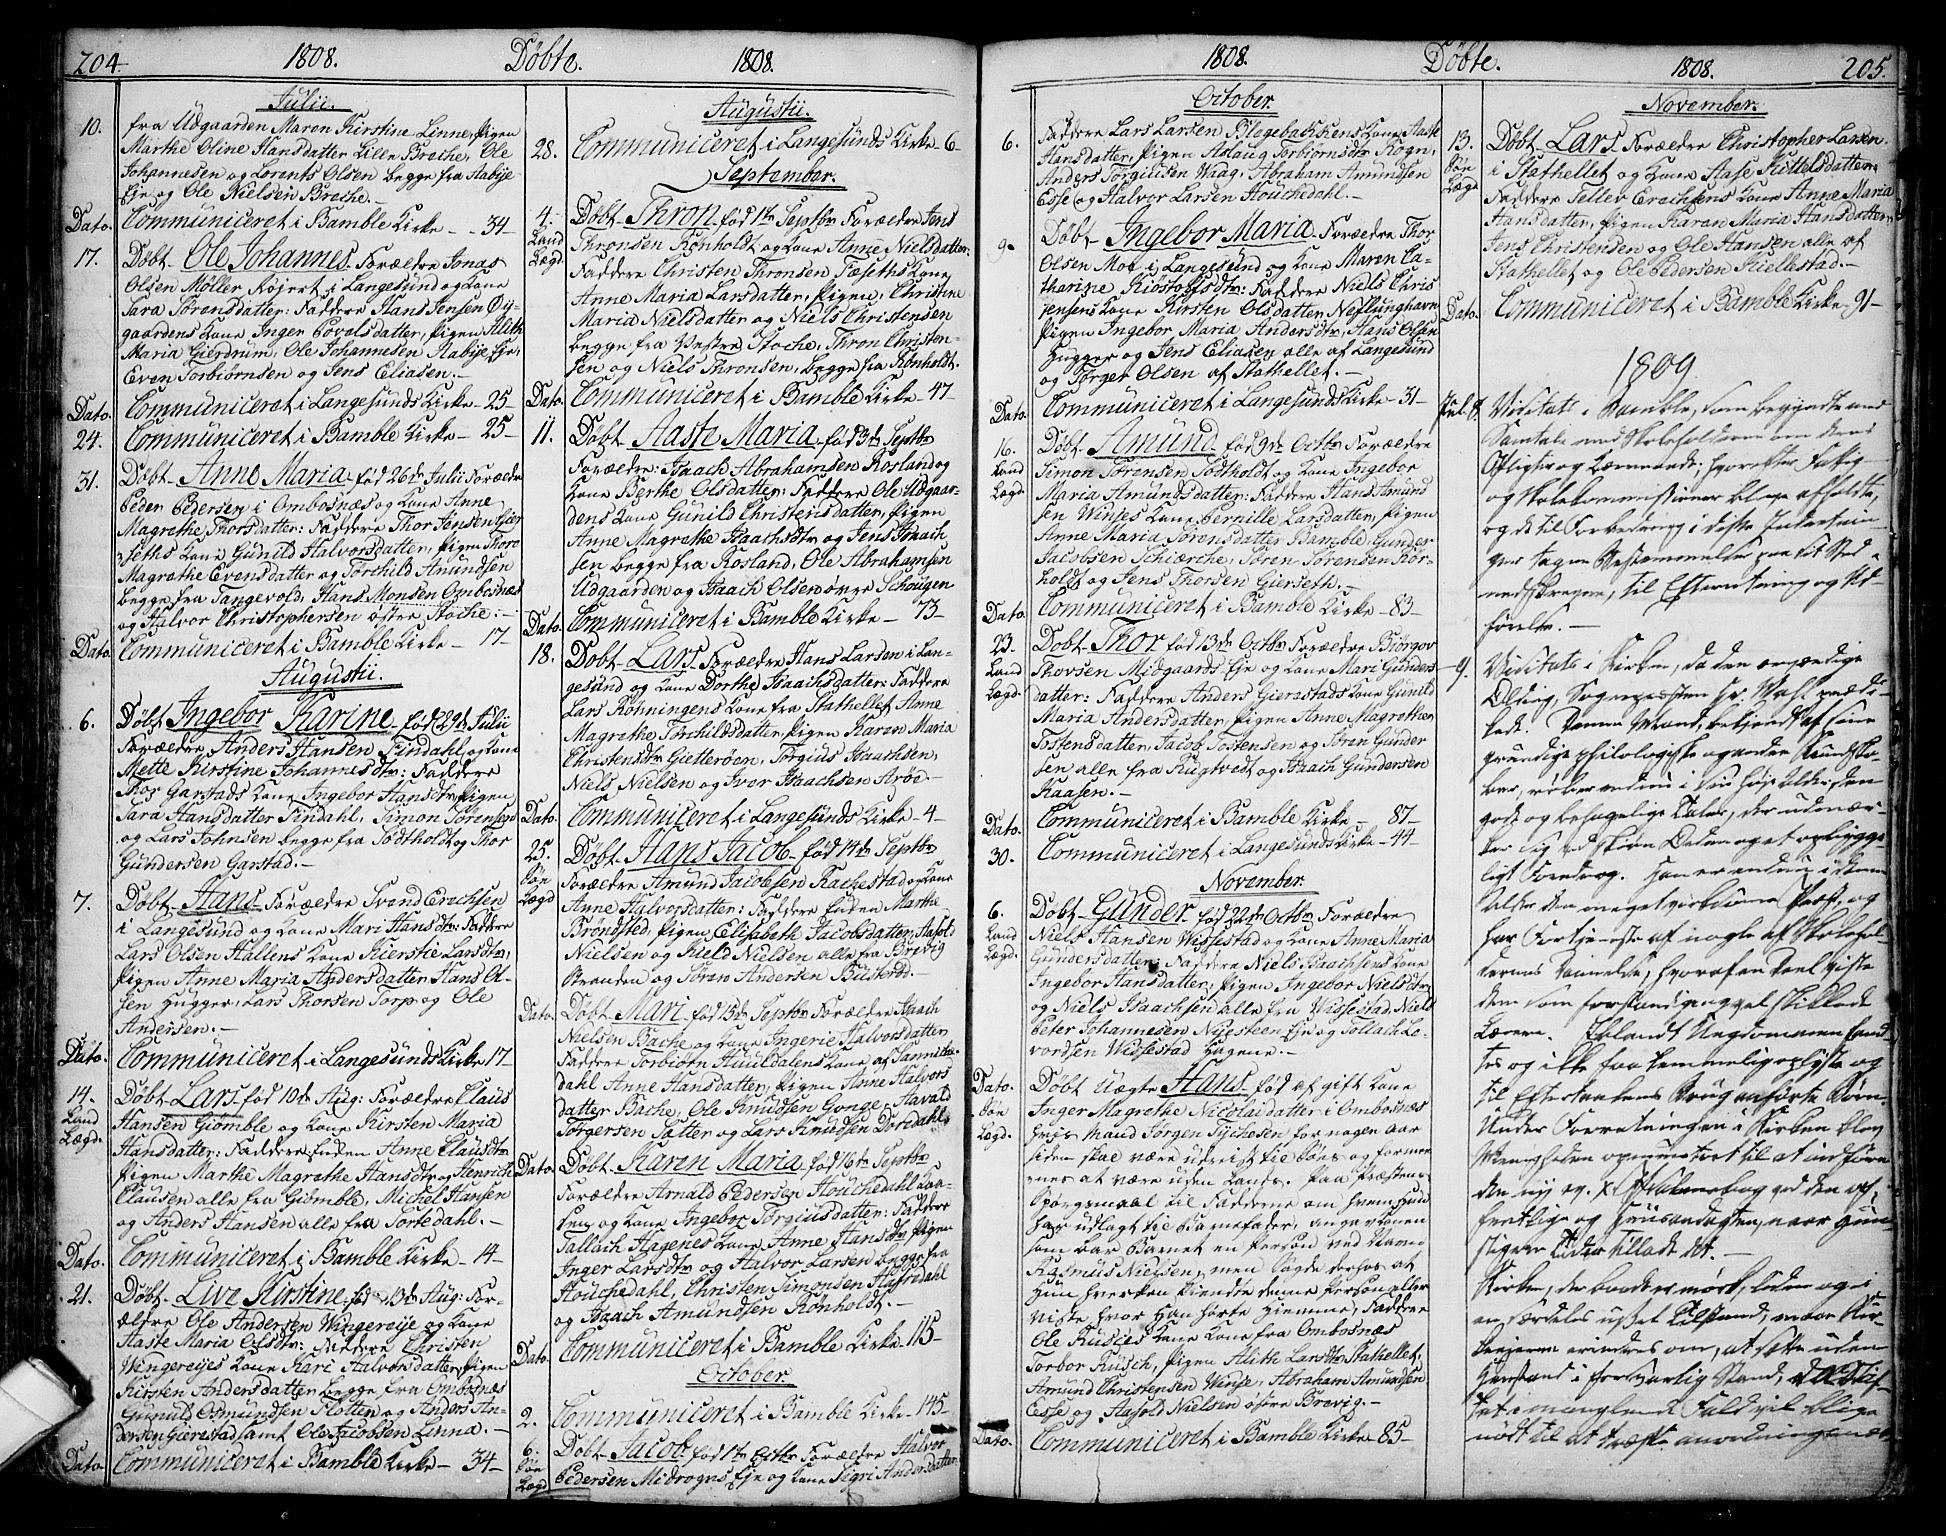 SAKO, Bamble kirkebøker, F/Fa/L0002: Ministerialbok nr. I 2, 1775-1814, s. 204-205